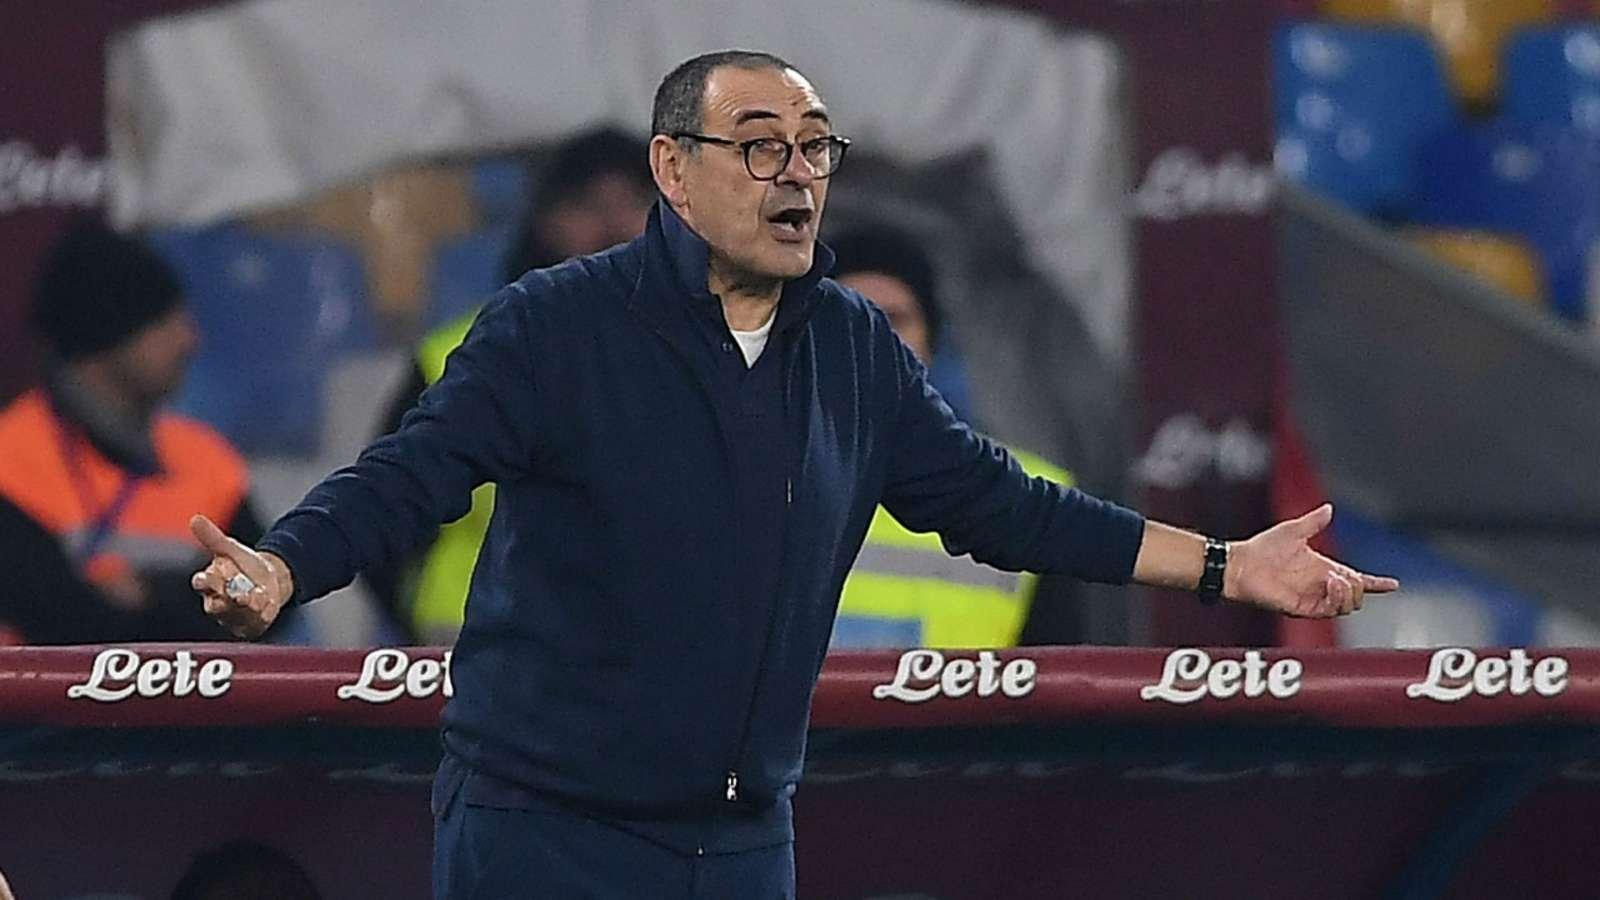 یوونتوس-سرمربی یوونتوس-سری آ-سن پائولو-ایتالیا-Juventus